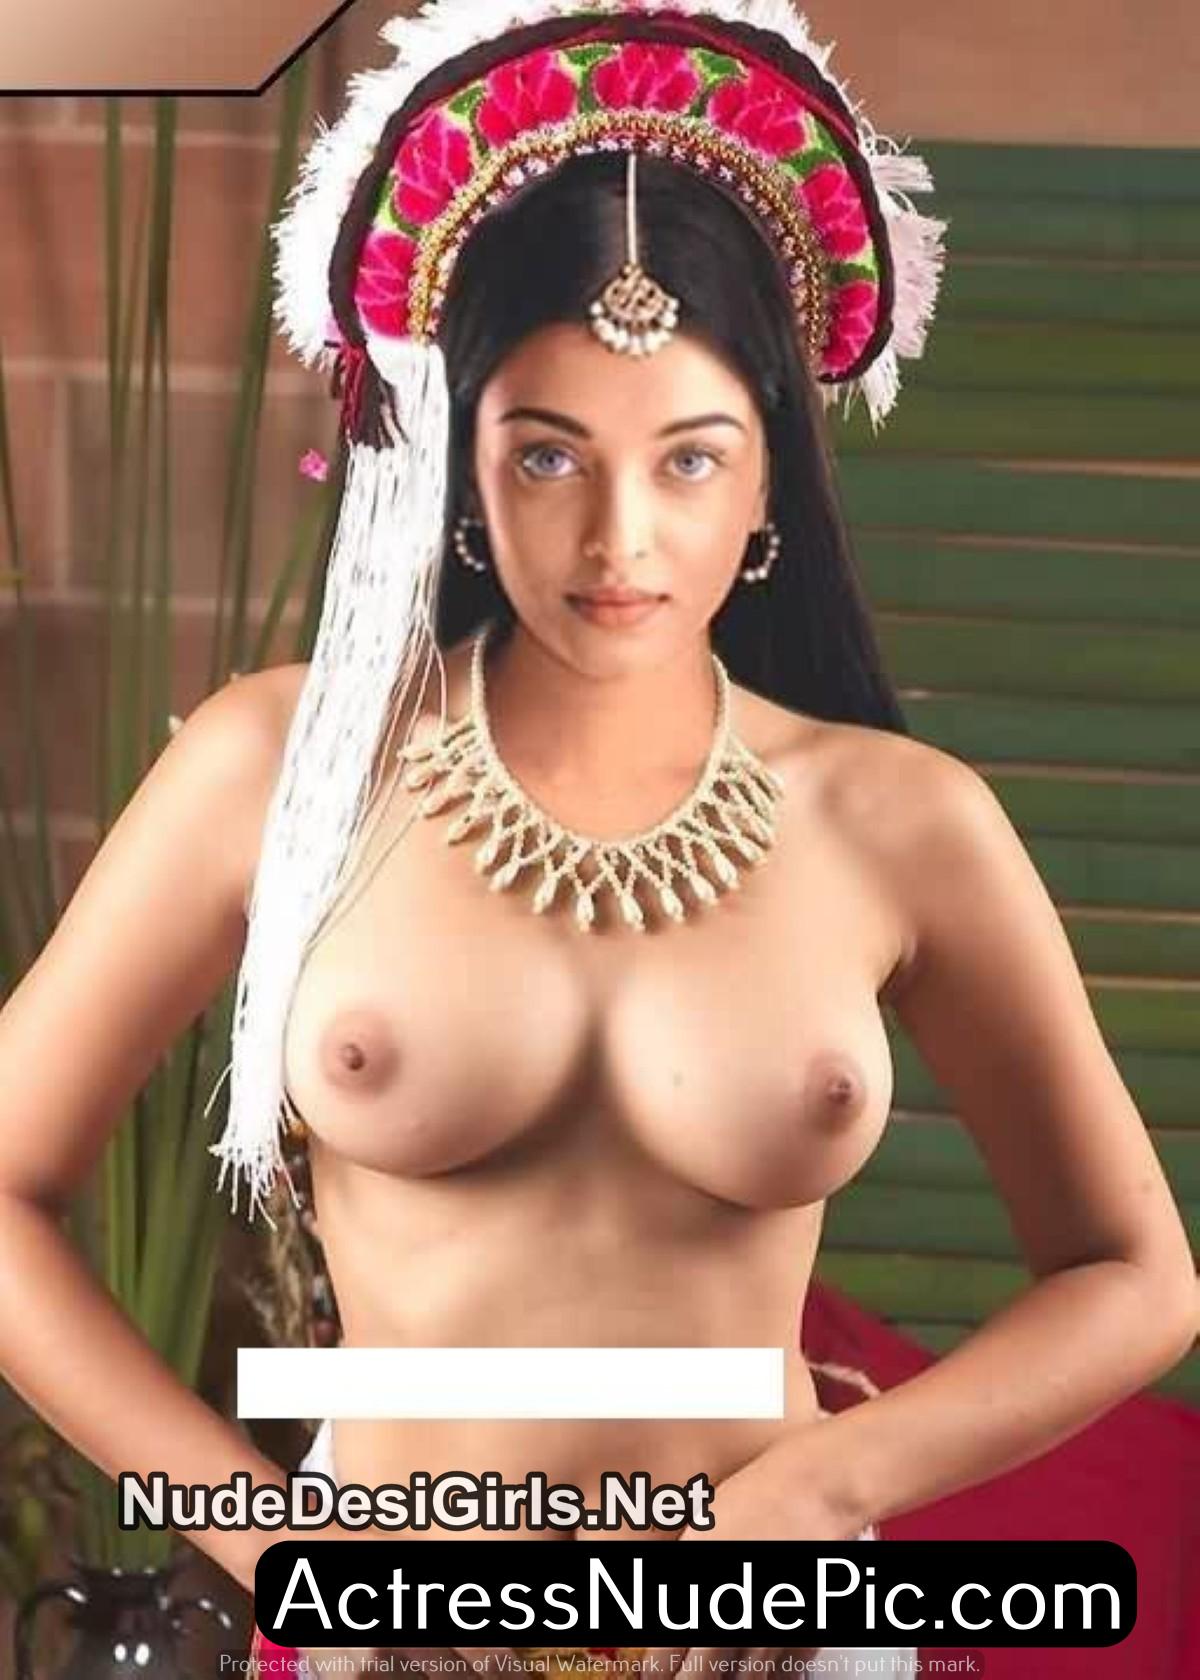 Aishwarya Rai nude, Aishwarya Rai hot, Aishwarya Rai bikini, Aishwarya Rai sex, Aishwarya Rai xxx, Aishwarya Rai porn, Aishwarya Rai boobs, Aishwarya Rai naked, Aishwarya Rai ass